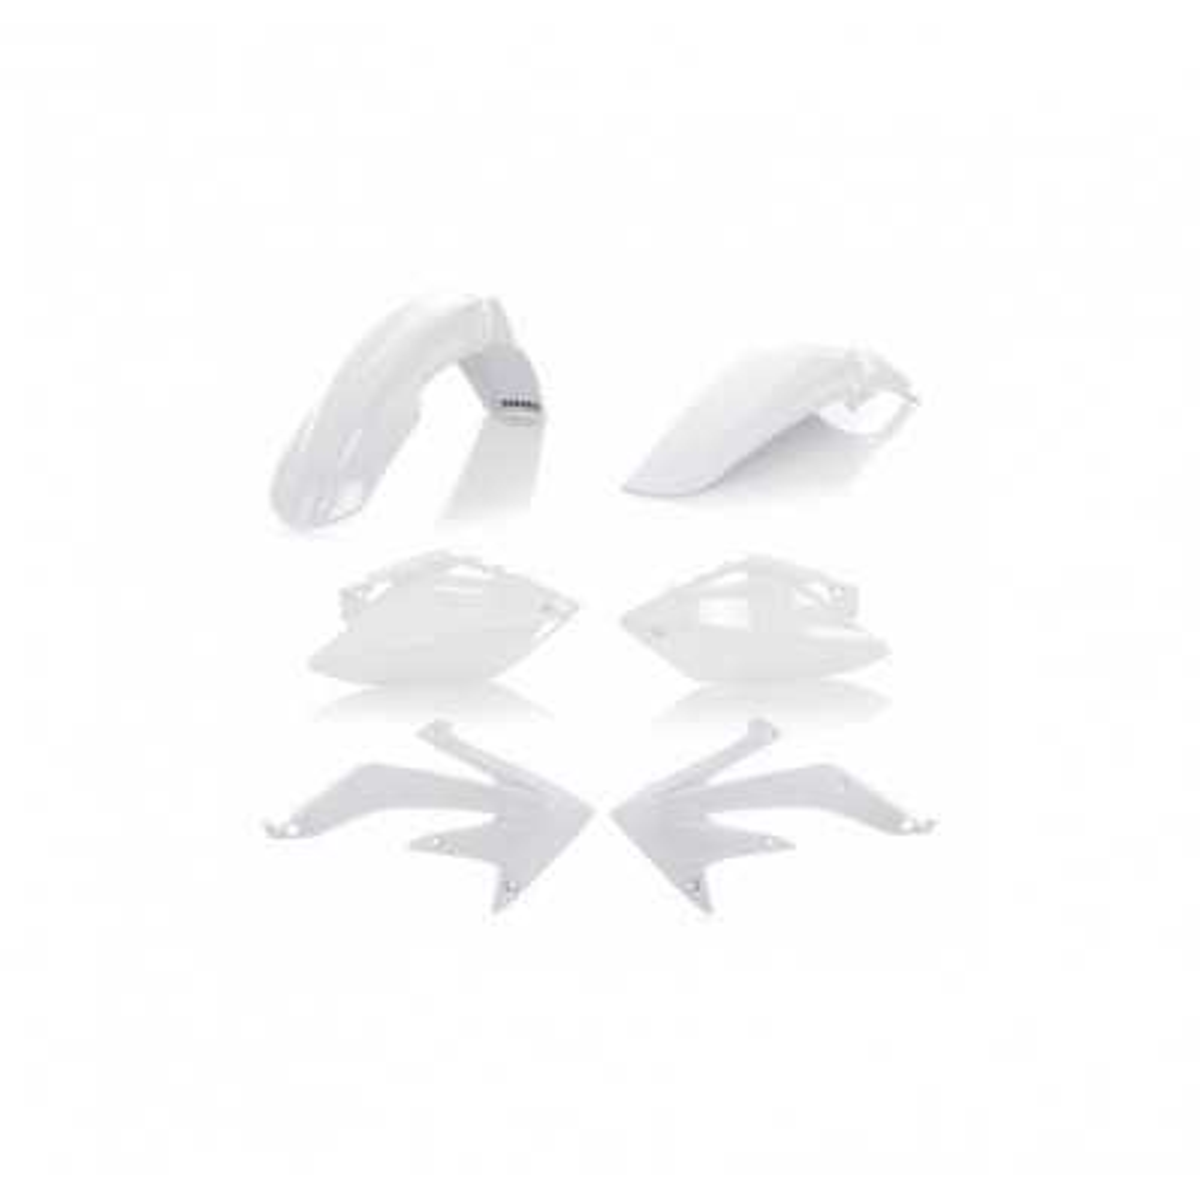 0010295-030 - Kit Plasticos Acerbis Crf450 07 08 Blanco